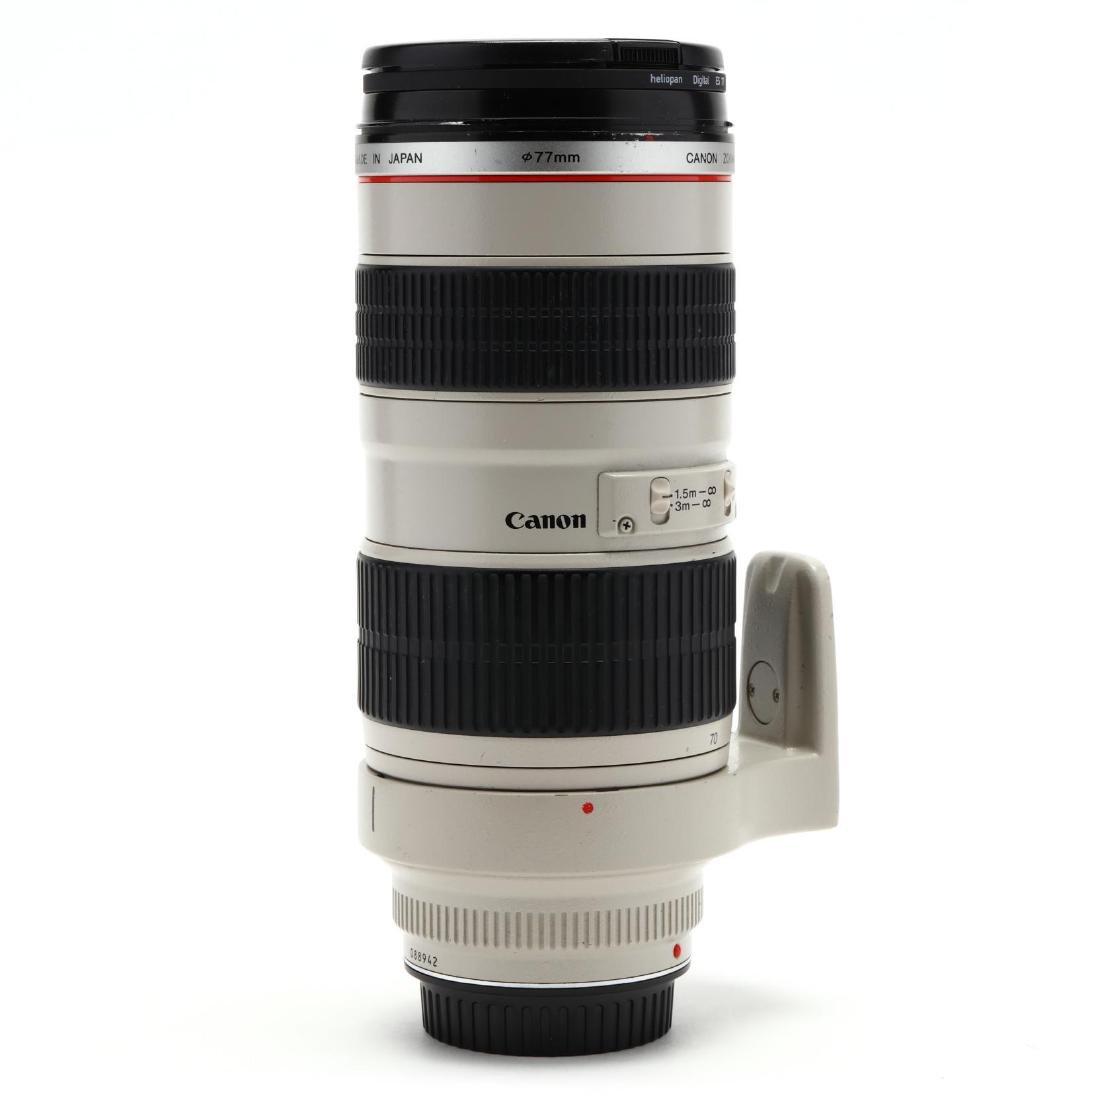 Canon 70-200mm Camera Lens - 2